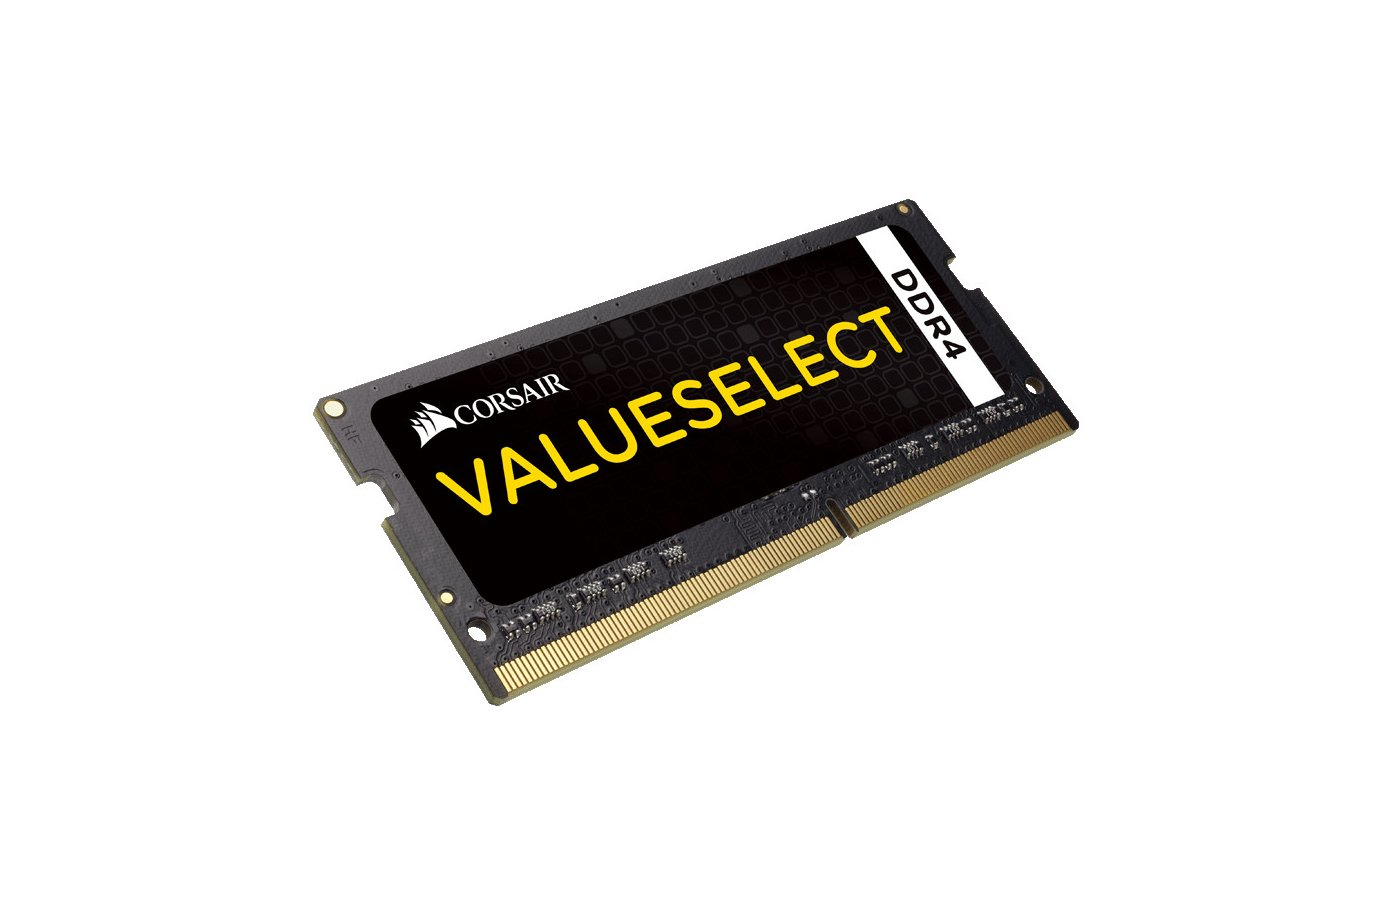 Оперативная память Corsair CMSO16GX4M2A2133C15 RTL PC4-17000 CL15 DDR4 2x8Gb 2133MHz SO-DIMM